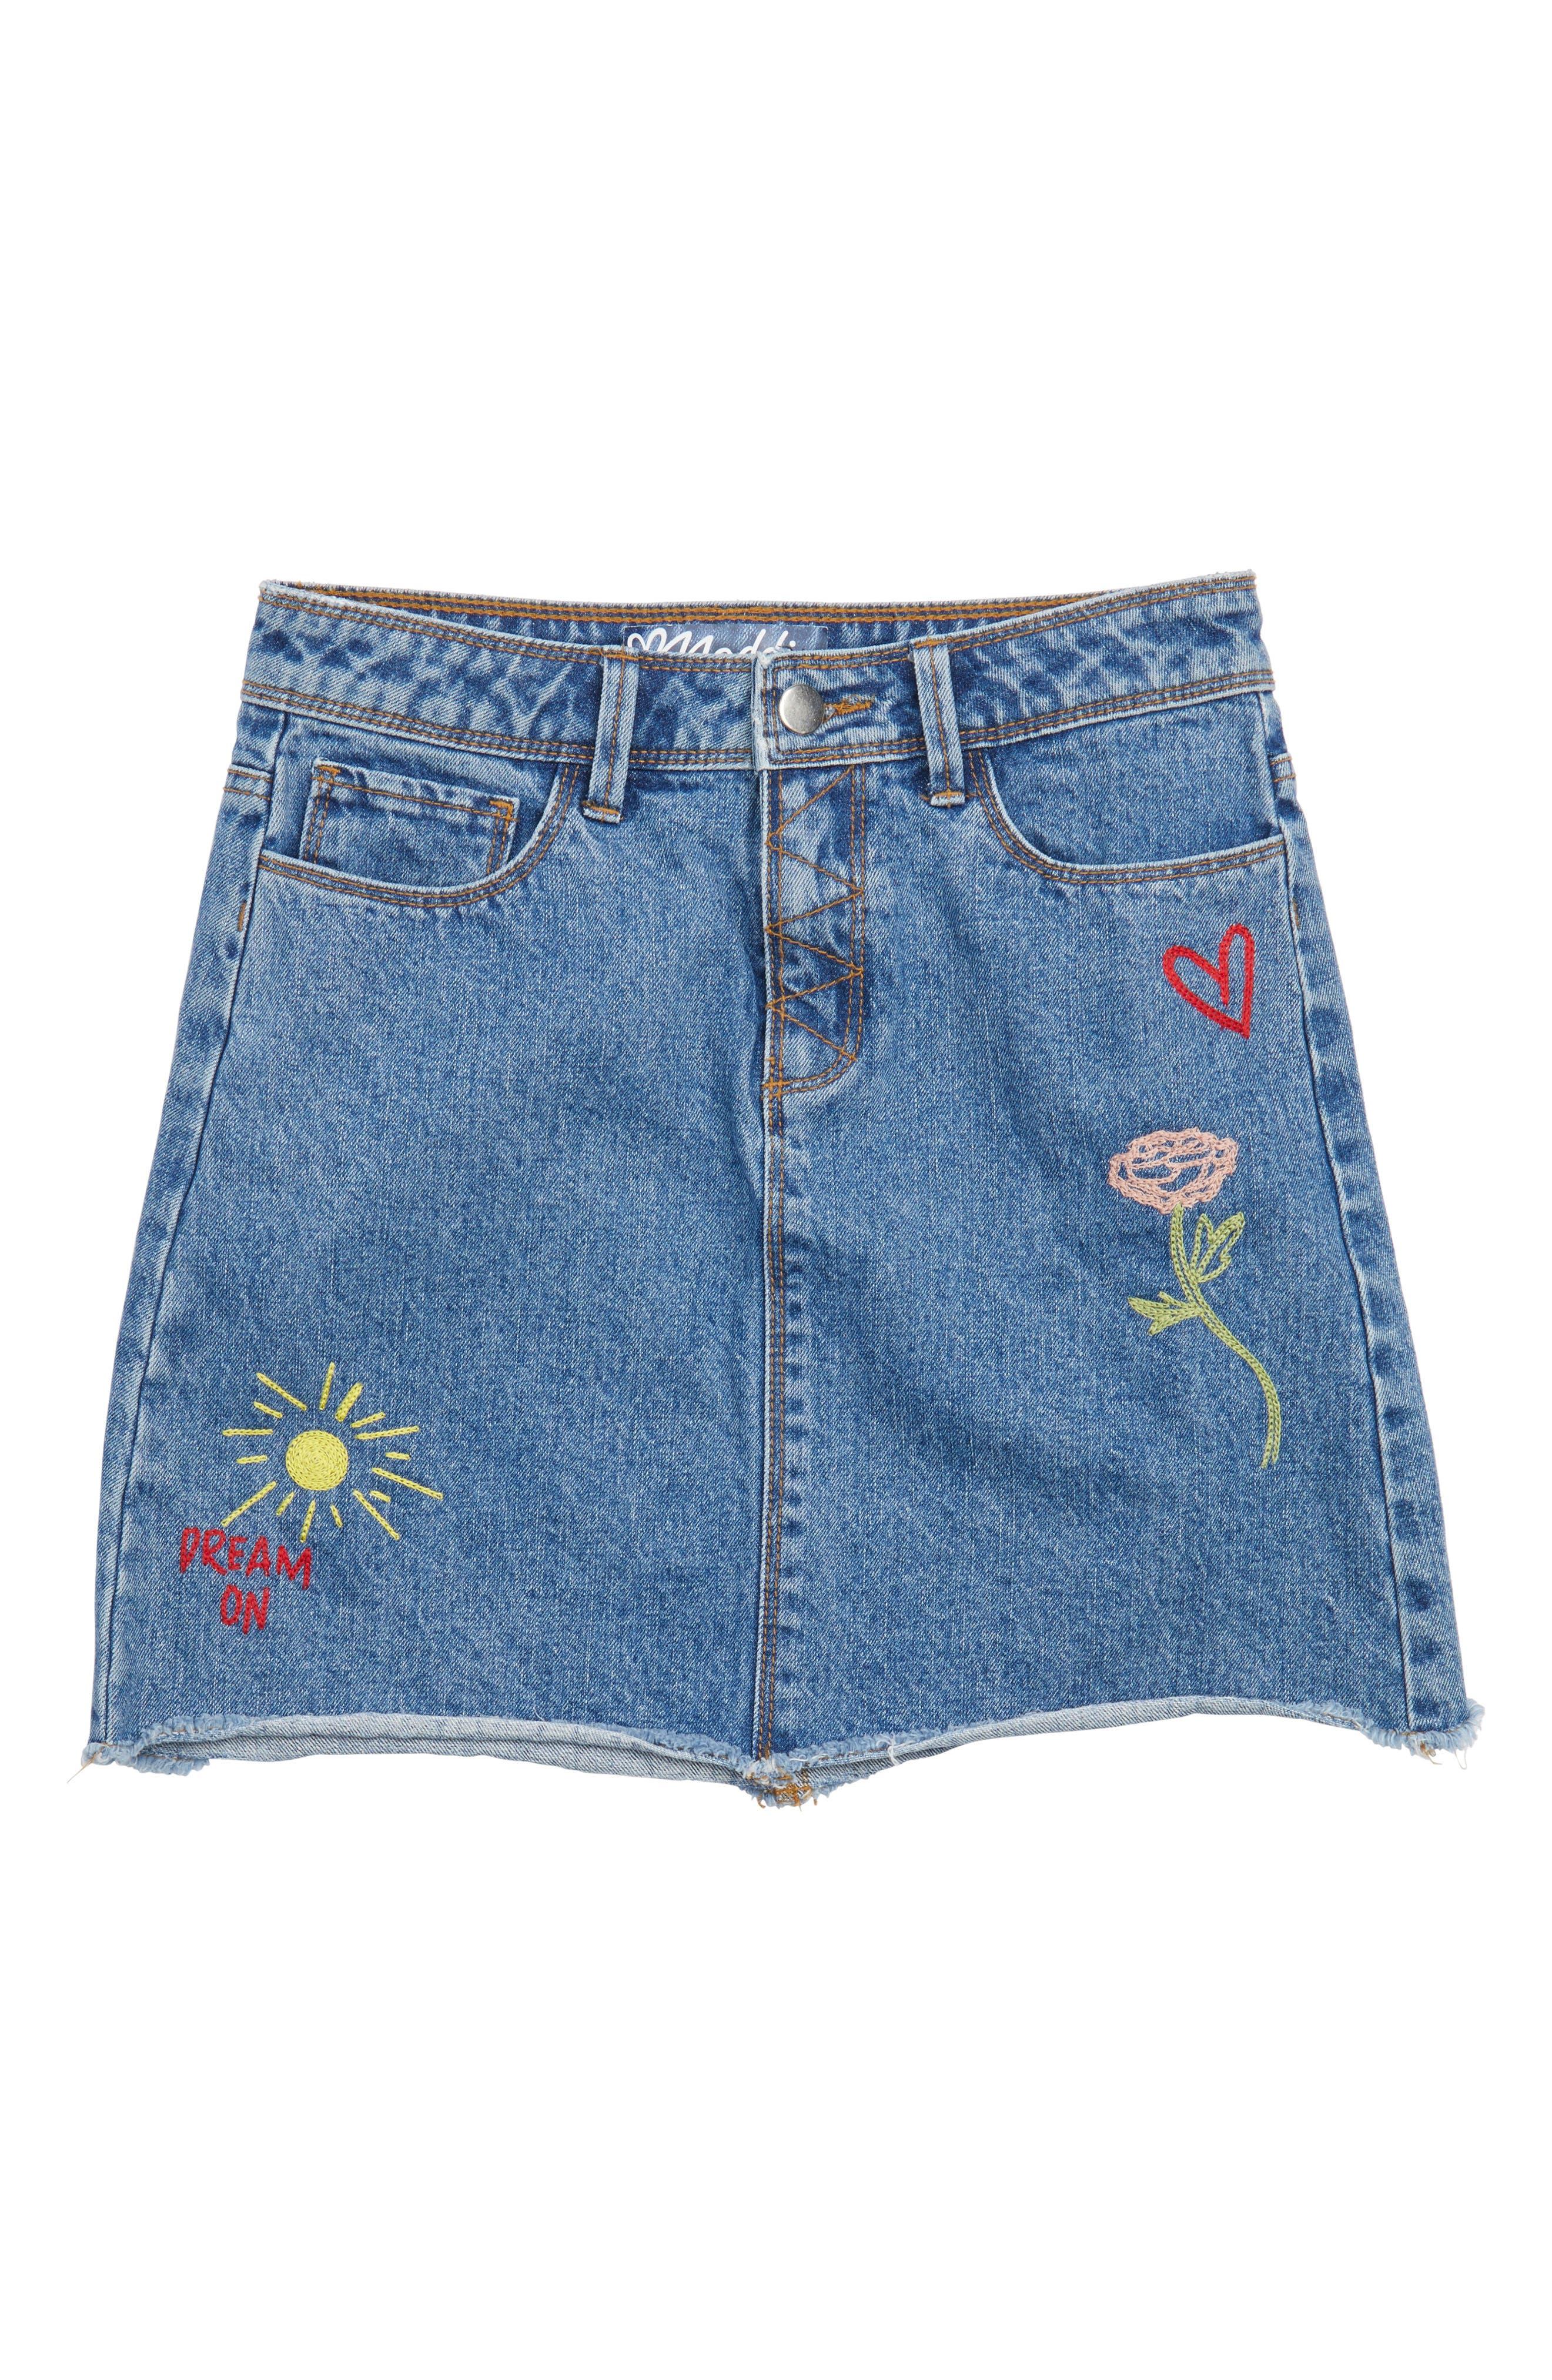 Embroidered Denim Skirt,                         Main,                         color, Light Blue